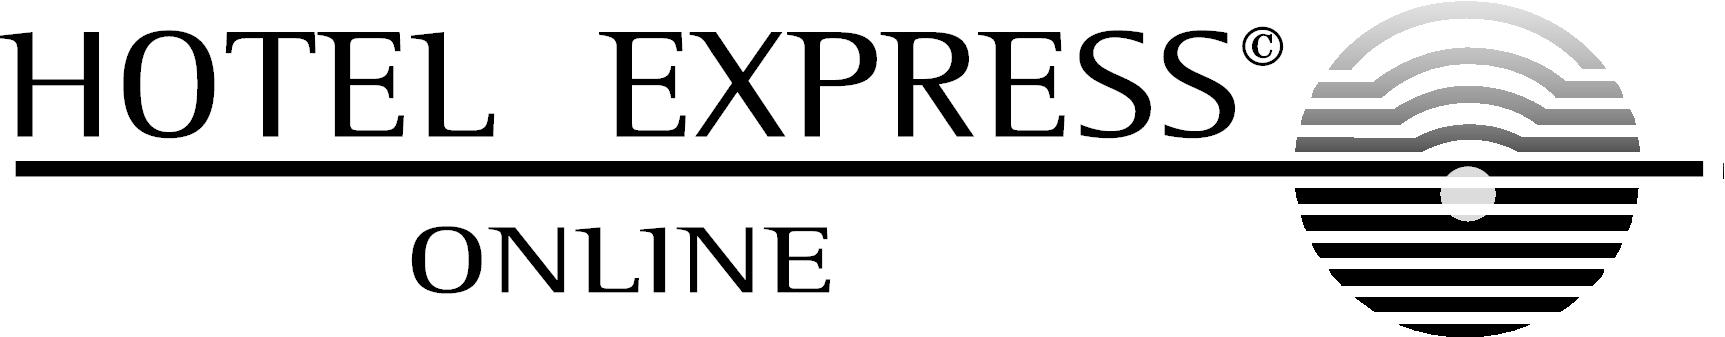 Hotel Express Online